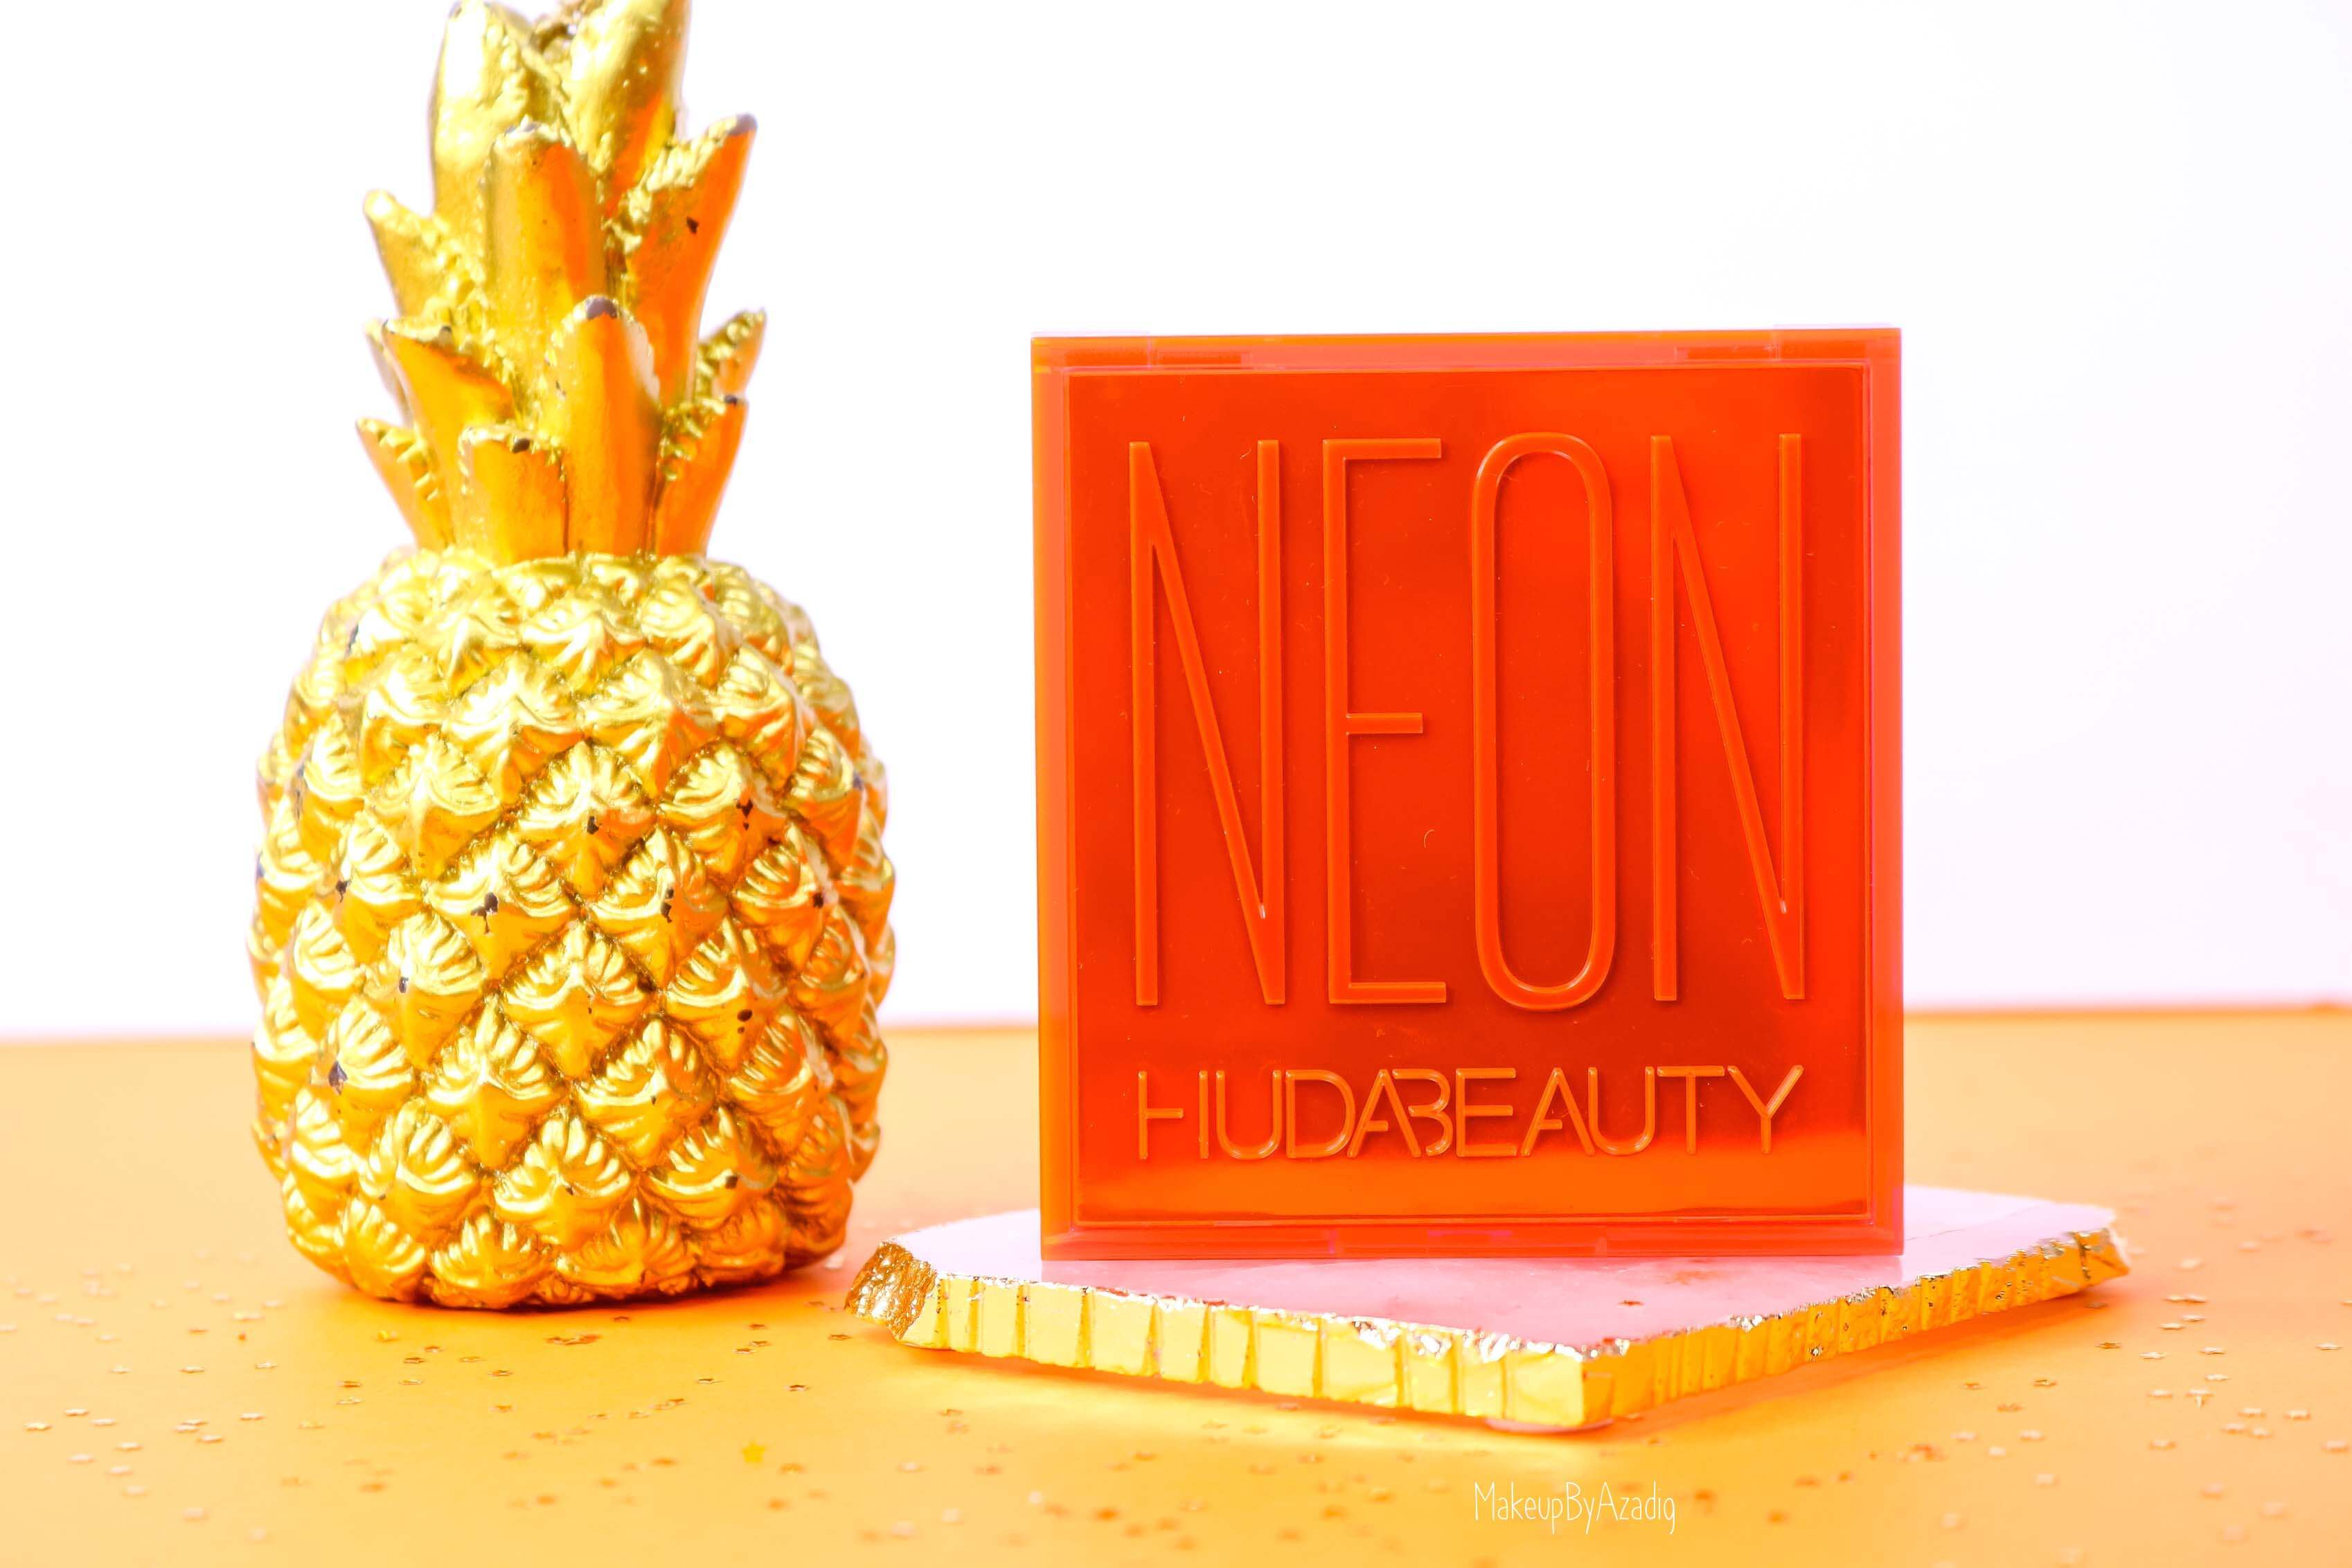 revue-review-palette-neon-obsession-huda-beauty-orange-pink-green-neon-palette-fard-paupieres-fluo-swatch-avis-prix-makeupbyazadig-flashy